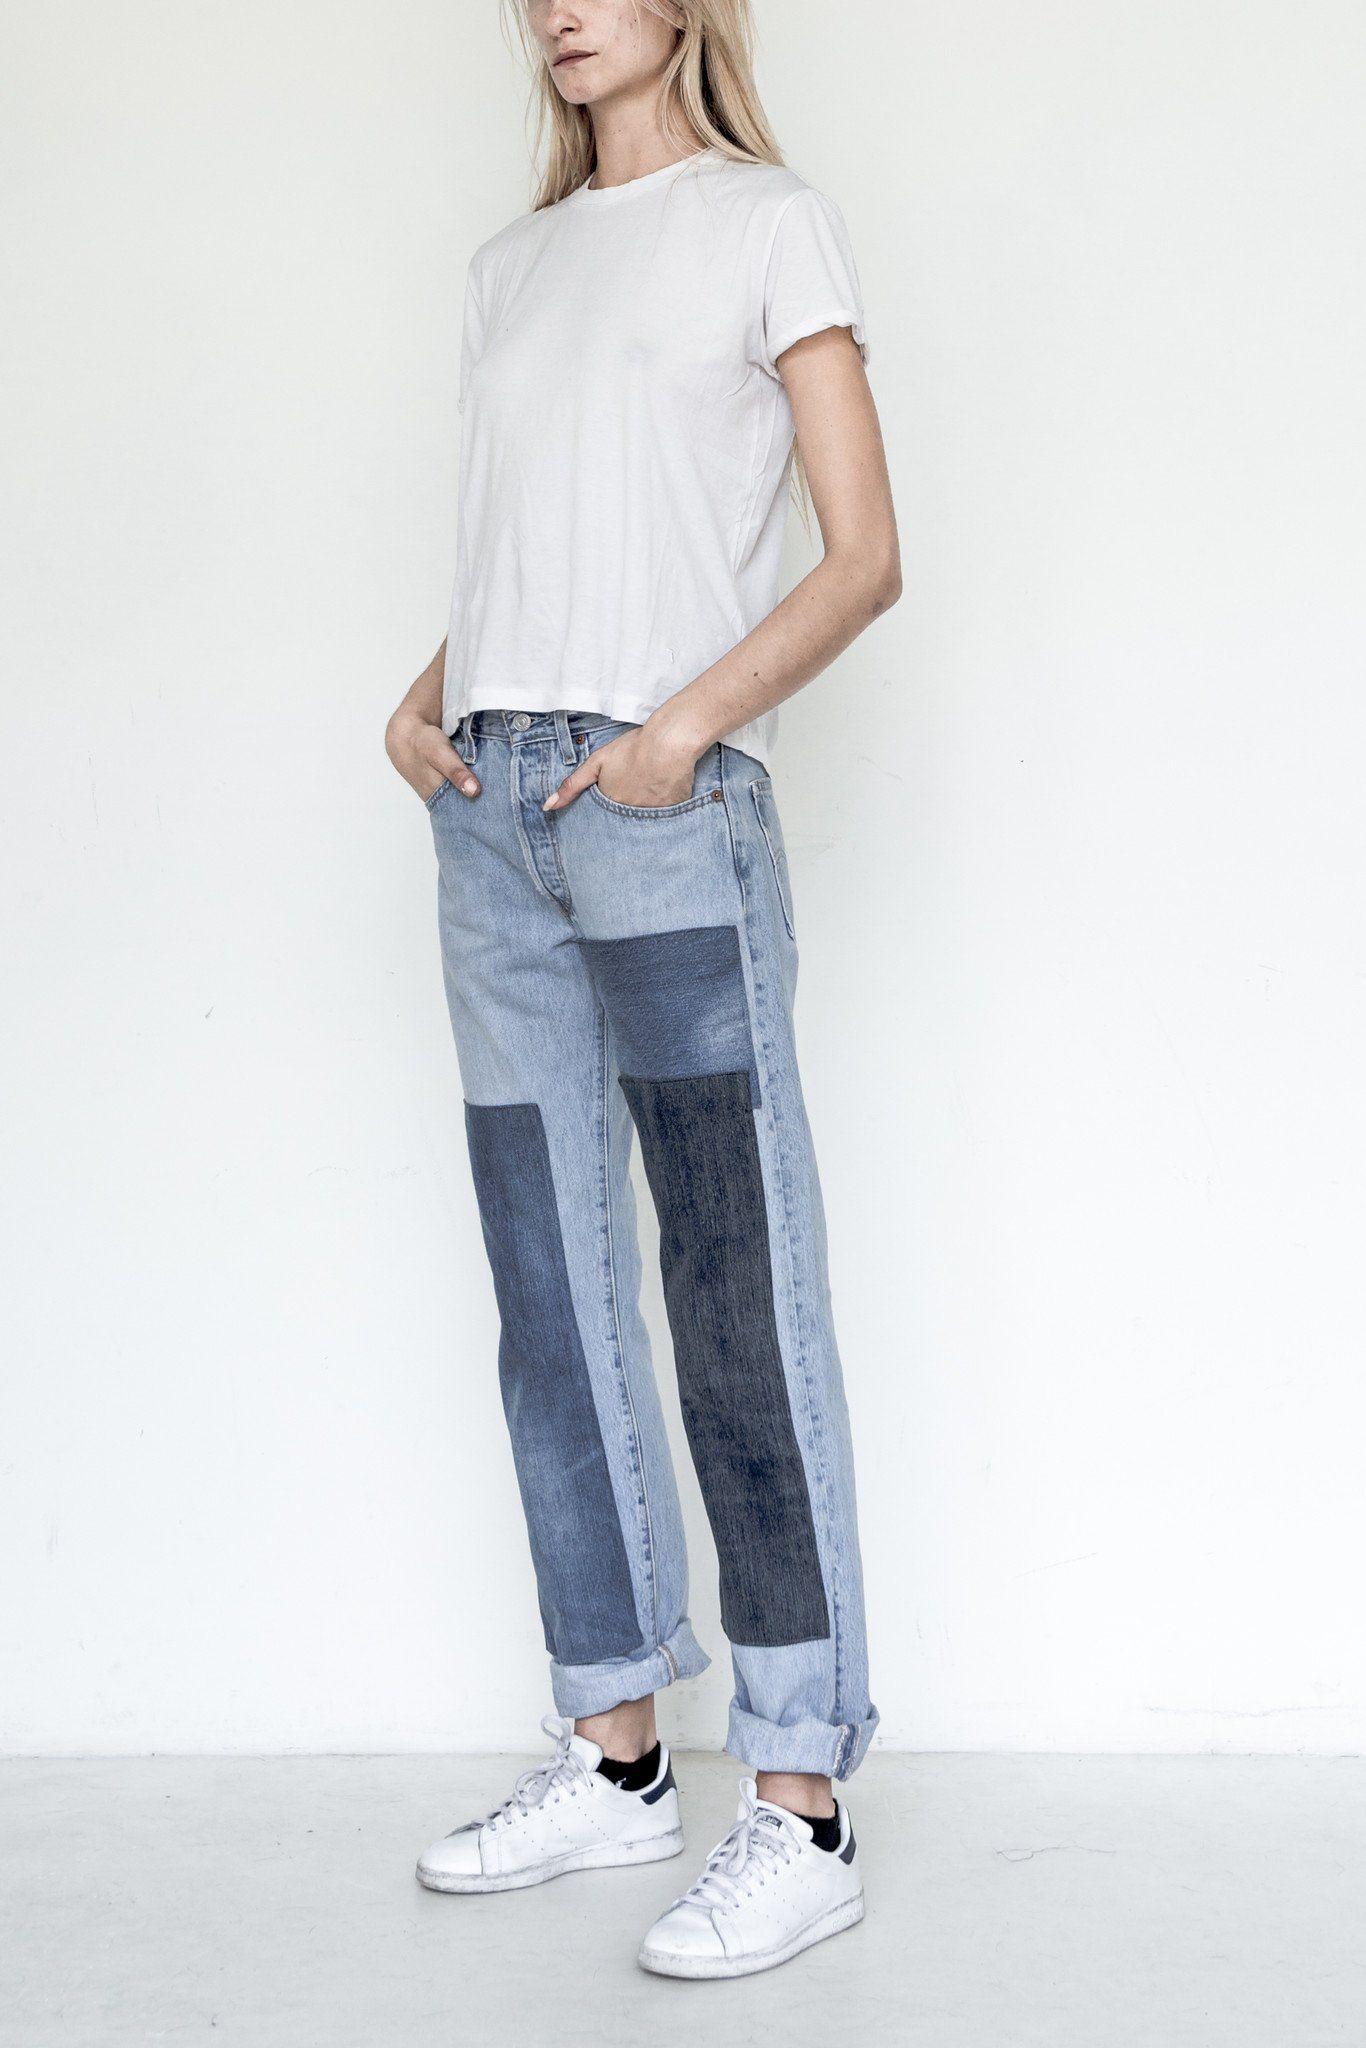 Cotton Unisex Patchwork Denim Ropa Moda Reciclar Jeans